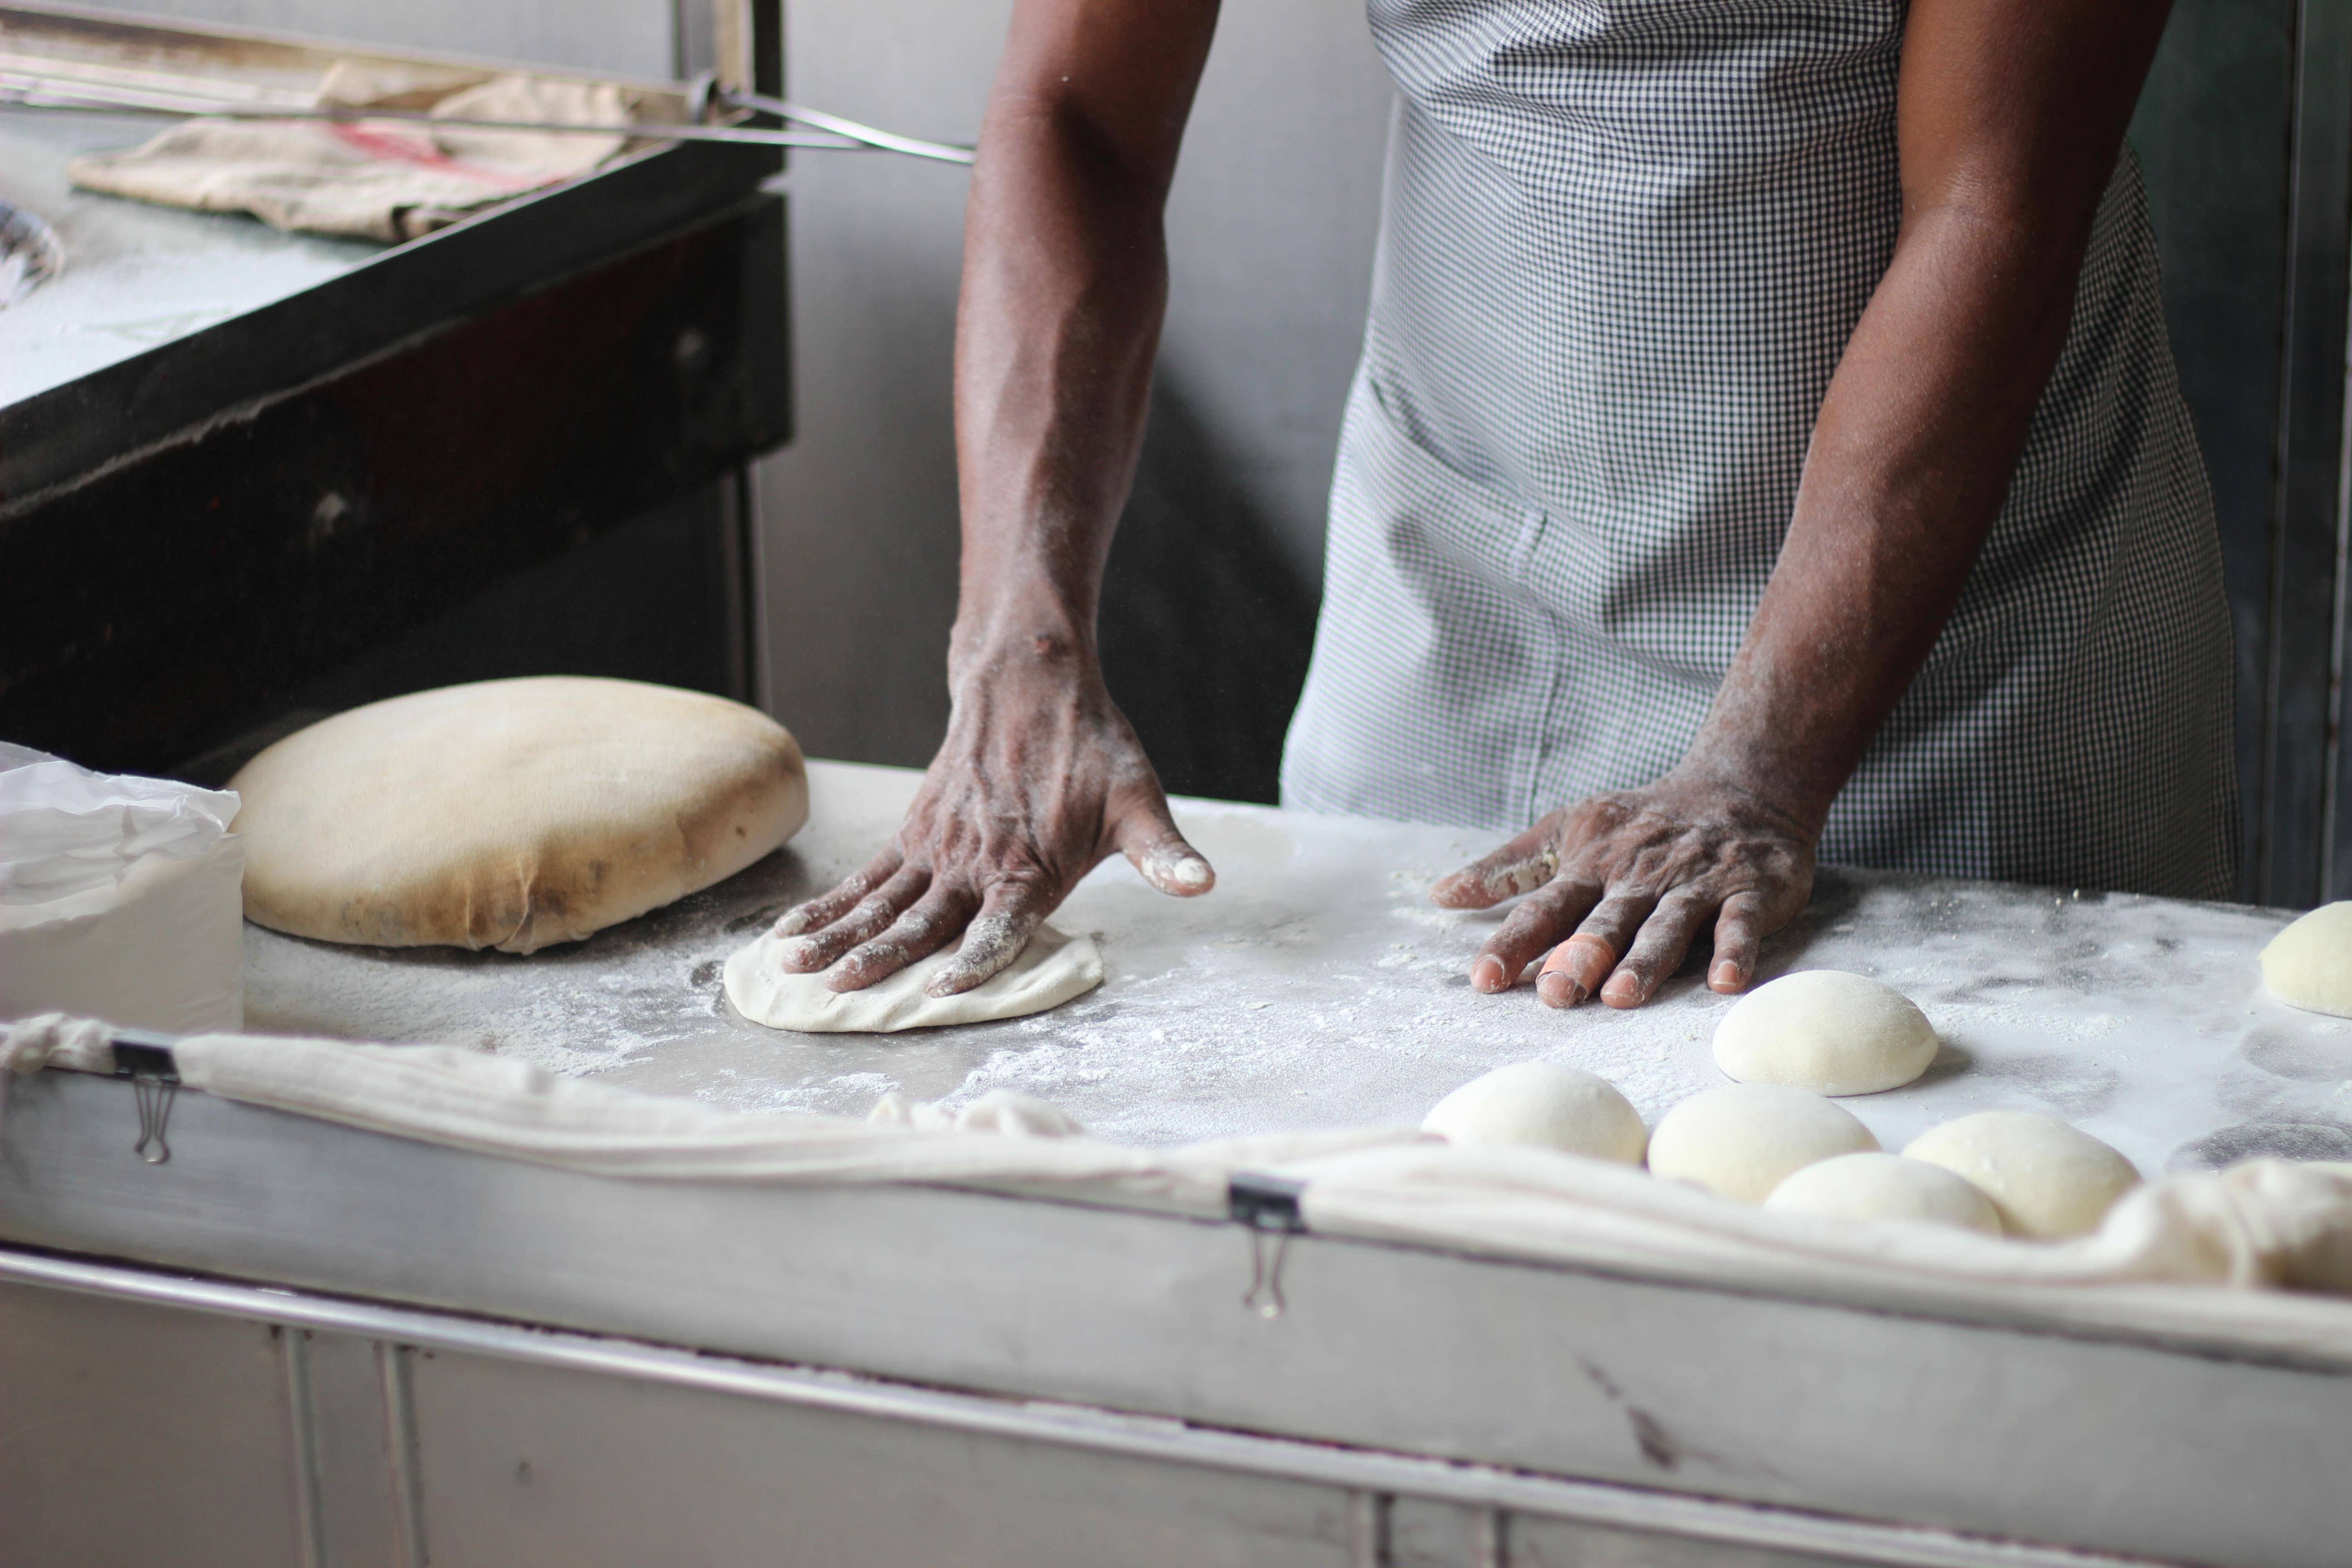 man-preparing-dough-for-bread-3218467